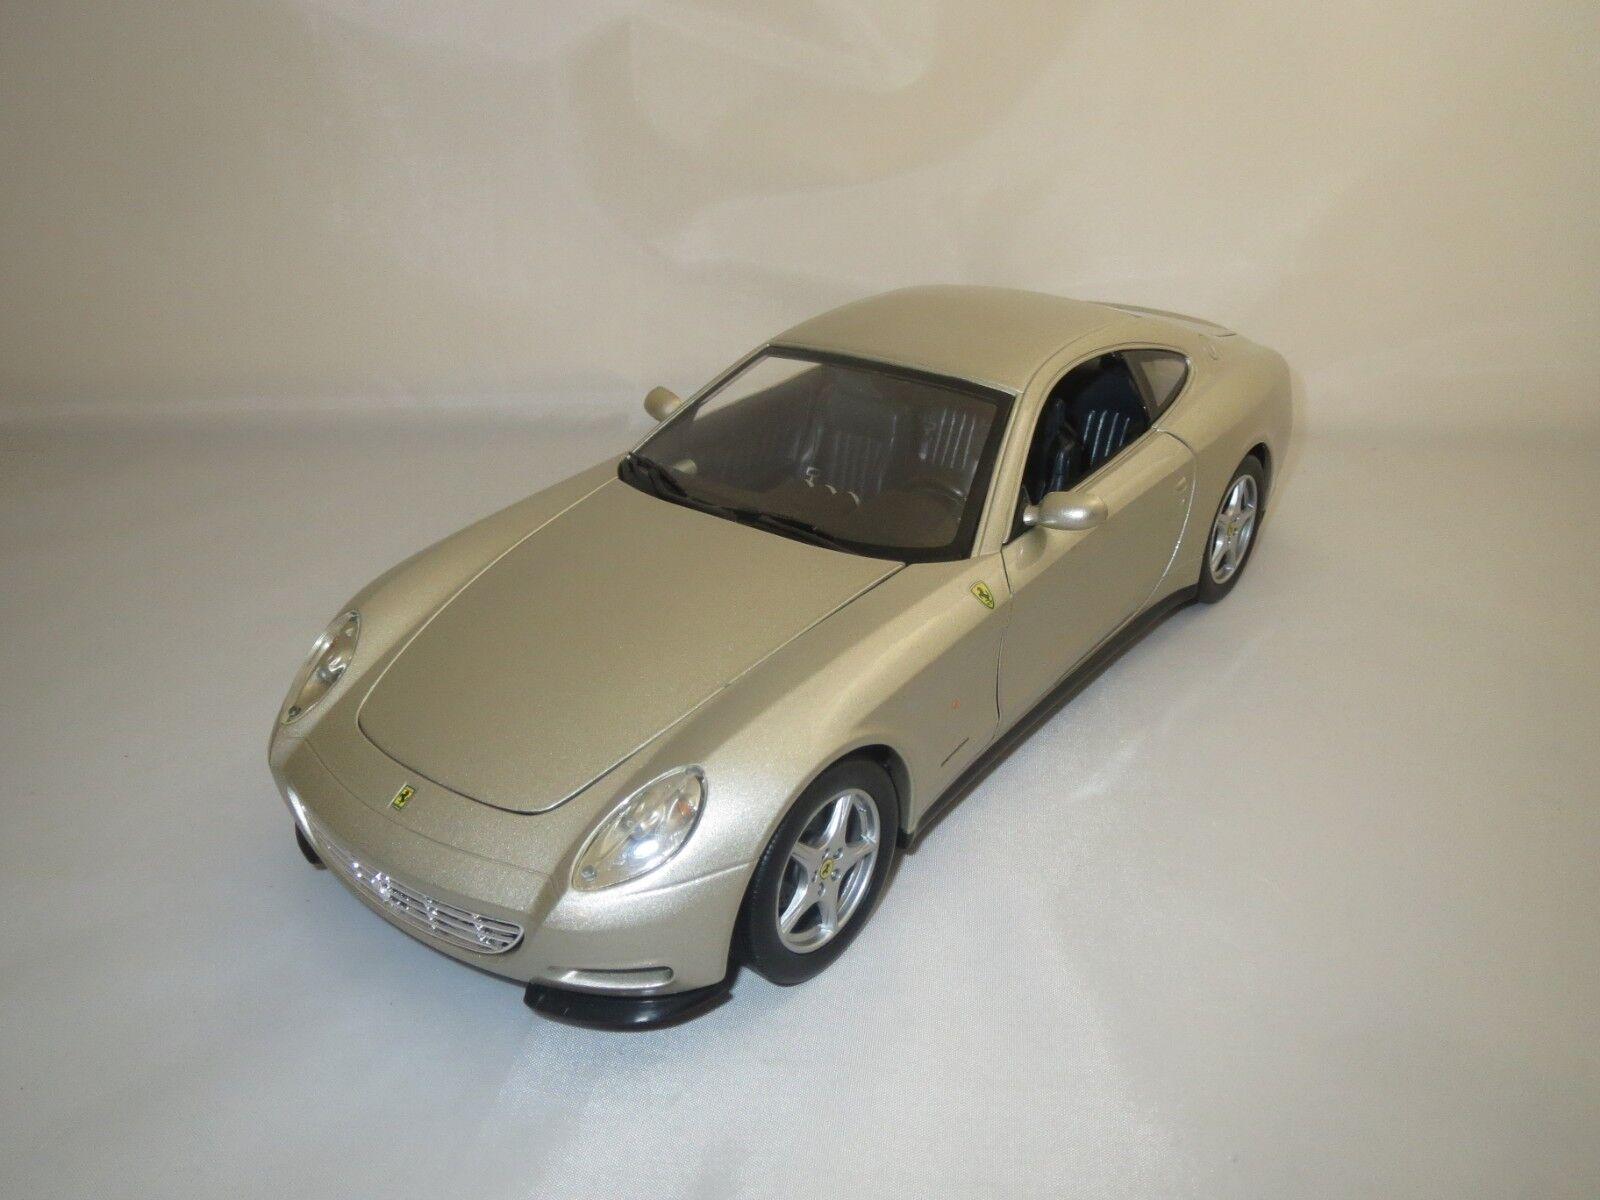 HOT WHEELS Mattel Ferrari 612 Scaglietti (Beige-Met.) 1 18 sans emballage